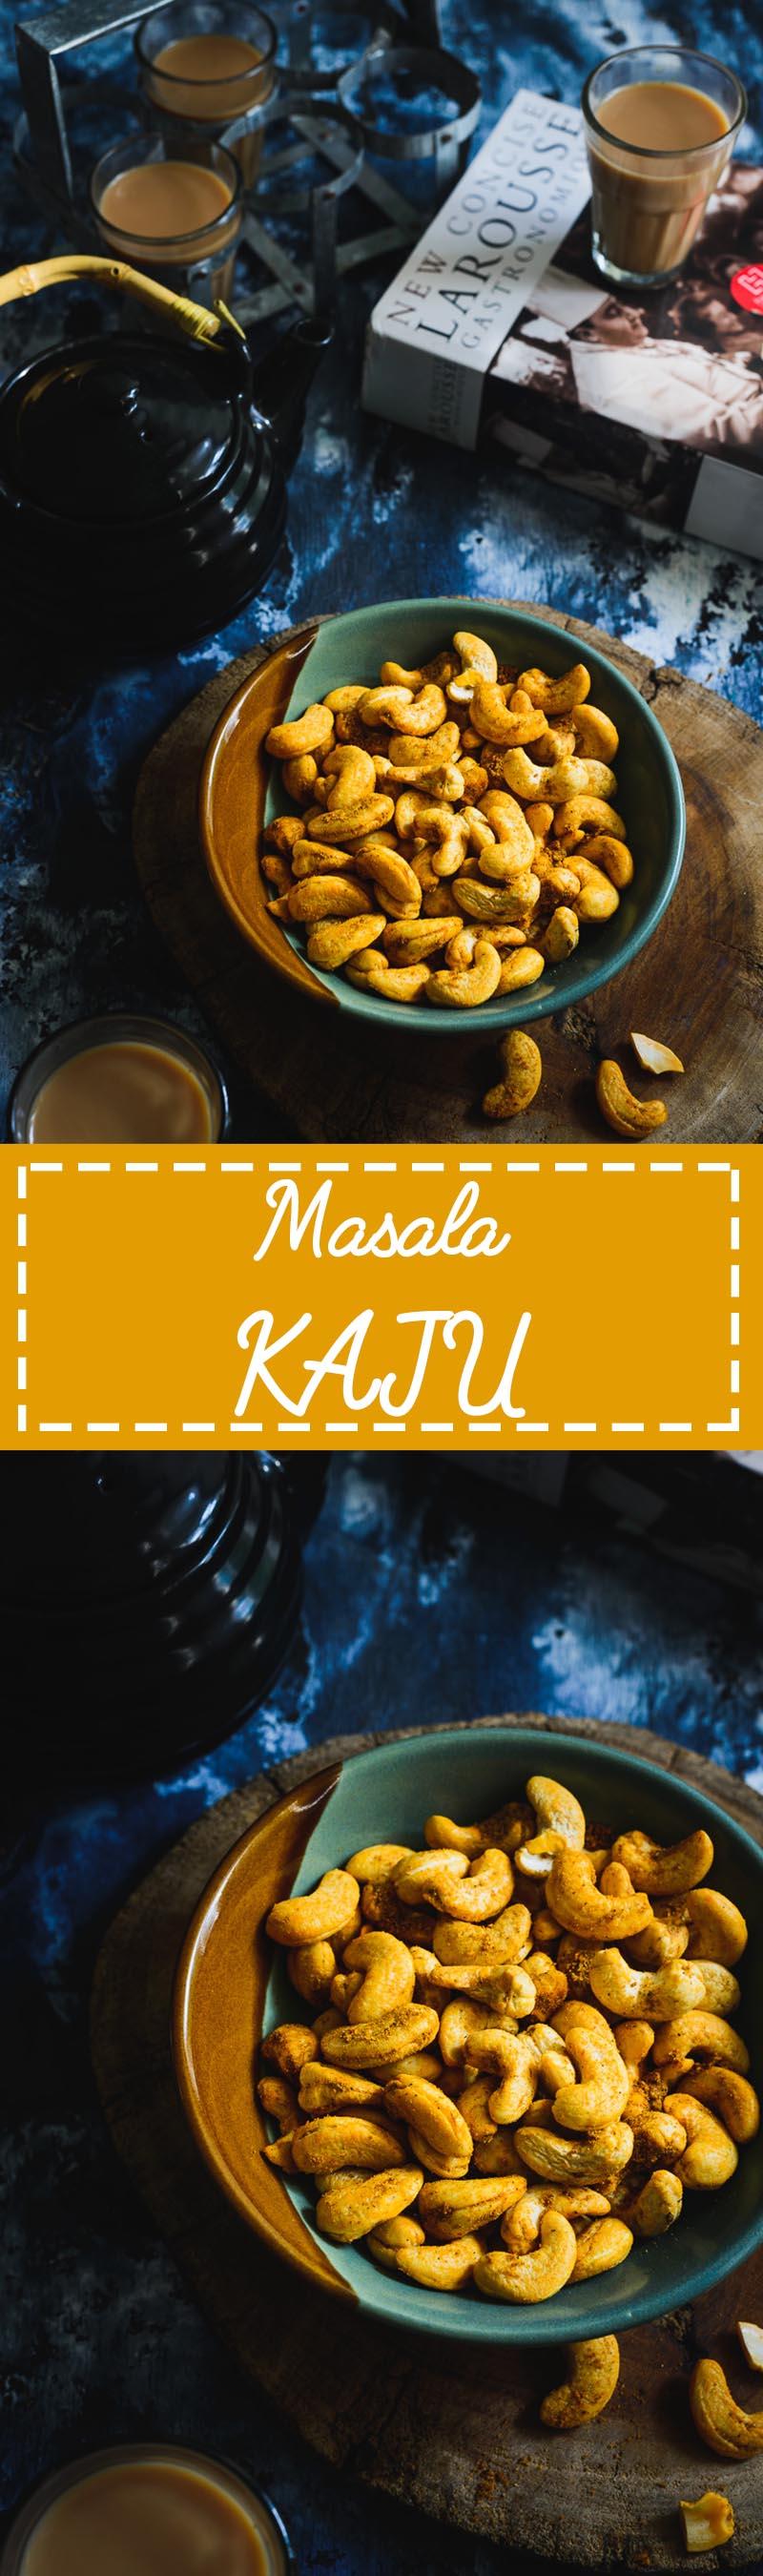 Masala Kaju. Healthy snack made using air fryer with